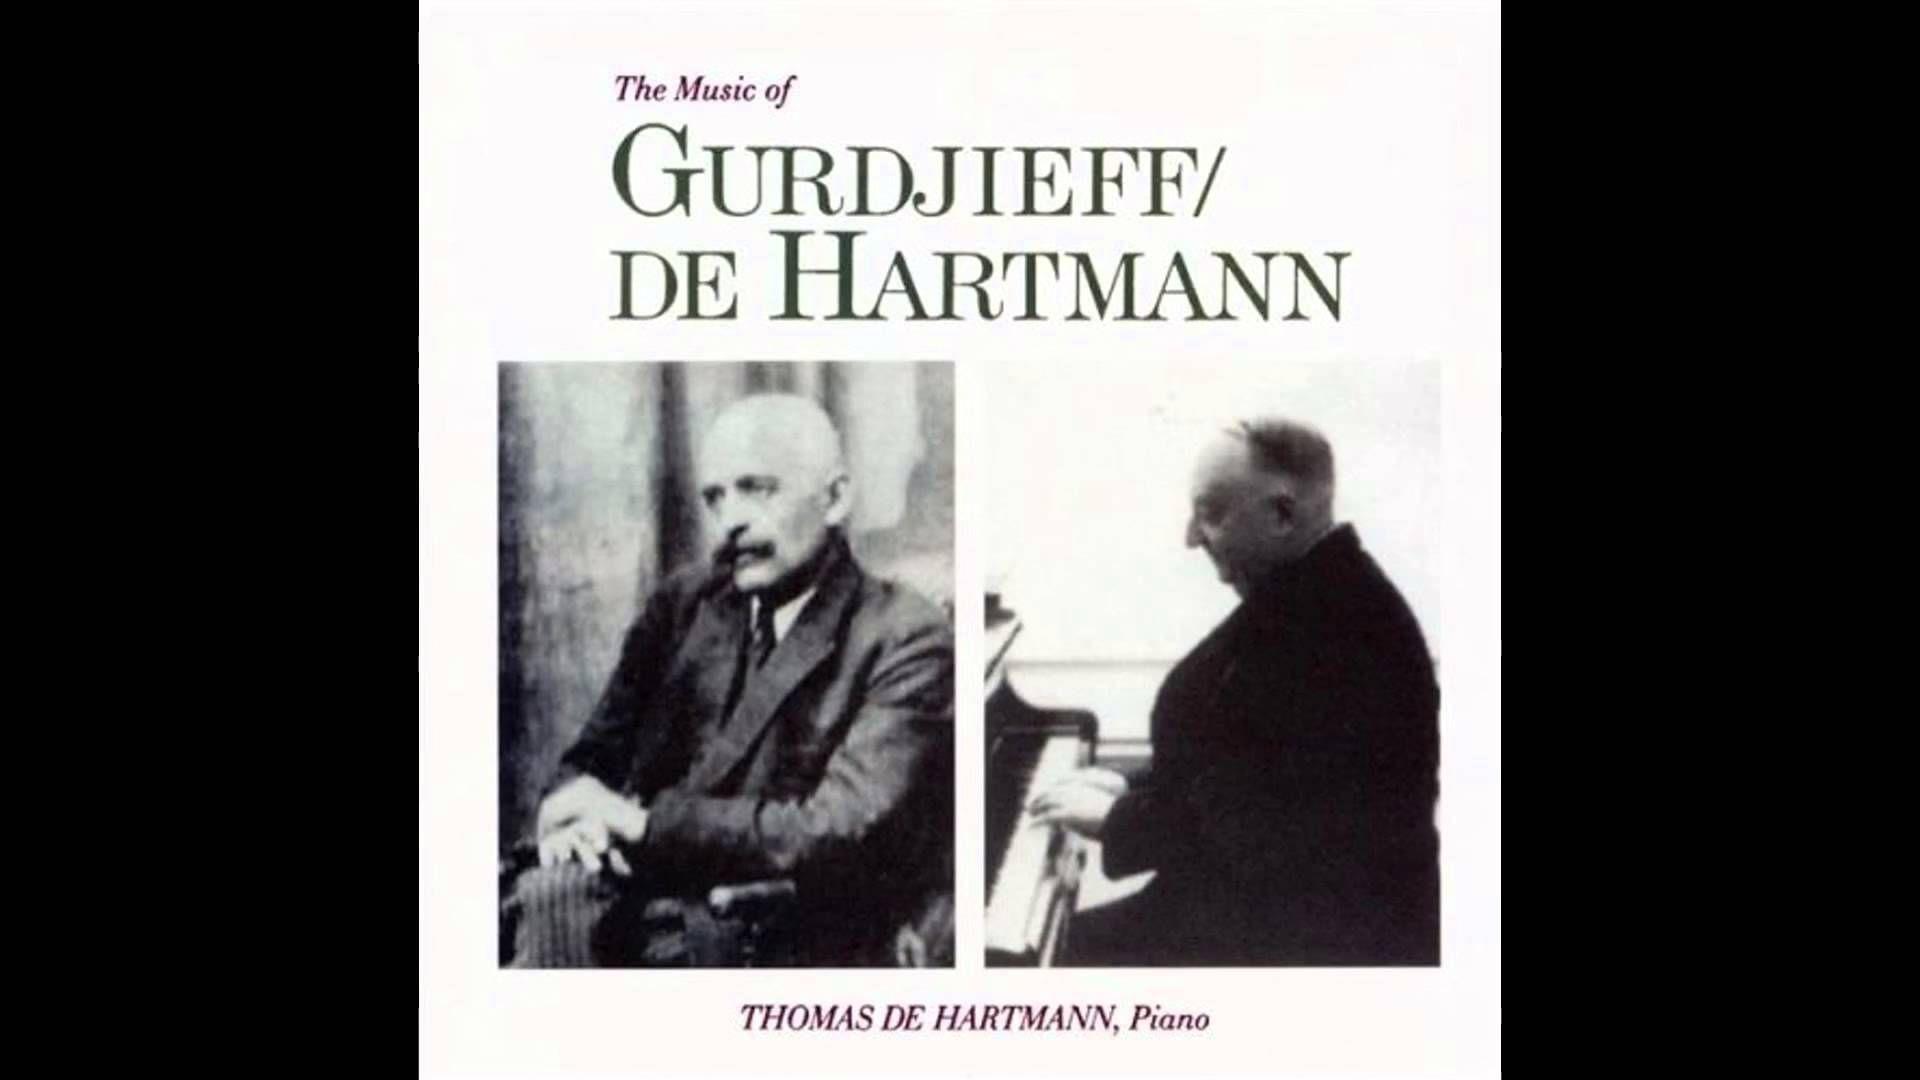 The Music Of Gurdjieff and Thomas De Hartmann (Vol 1, full album)